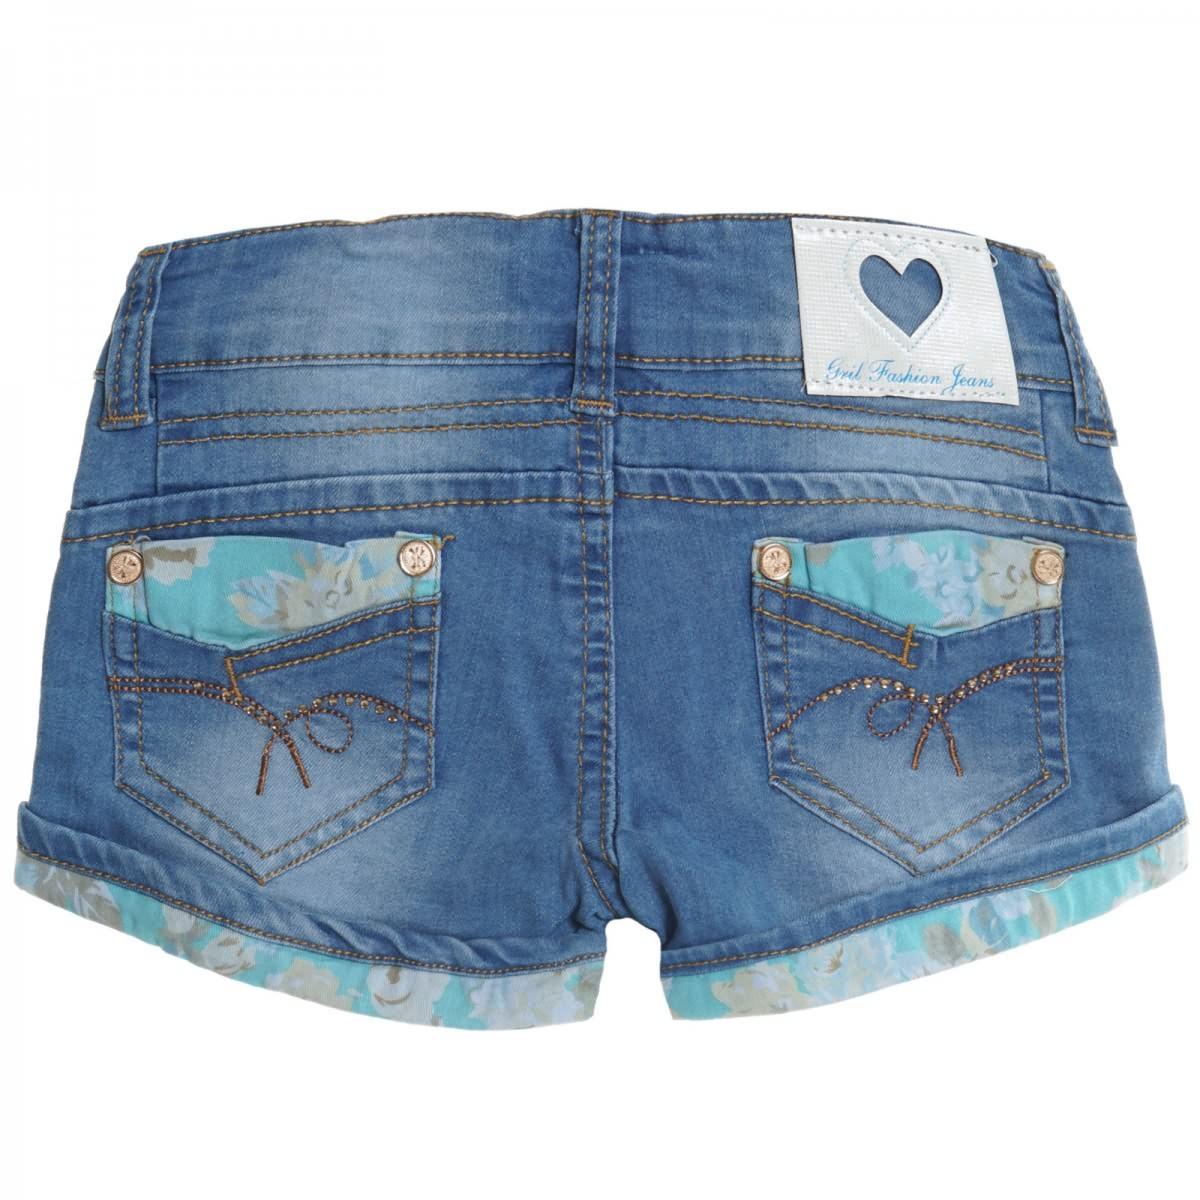 Details zu Kinder Mädchen Kurze Hose Bermuda Shorts Sommer Capri Pump Pants Jeans 20411